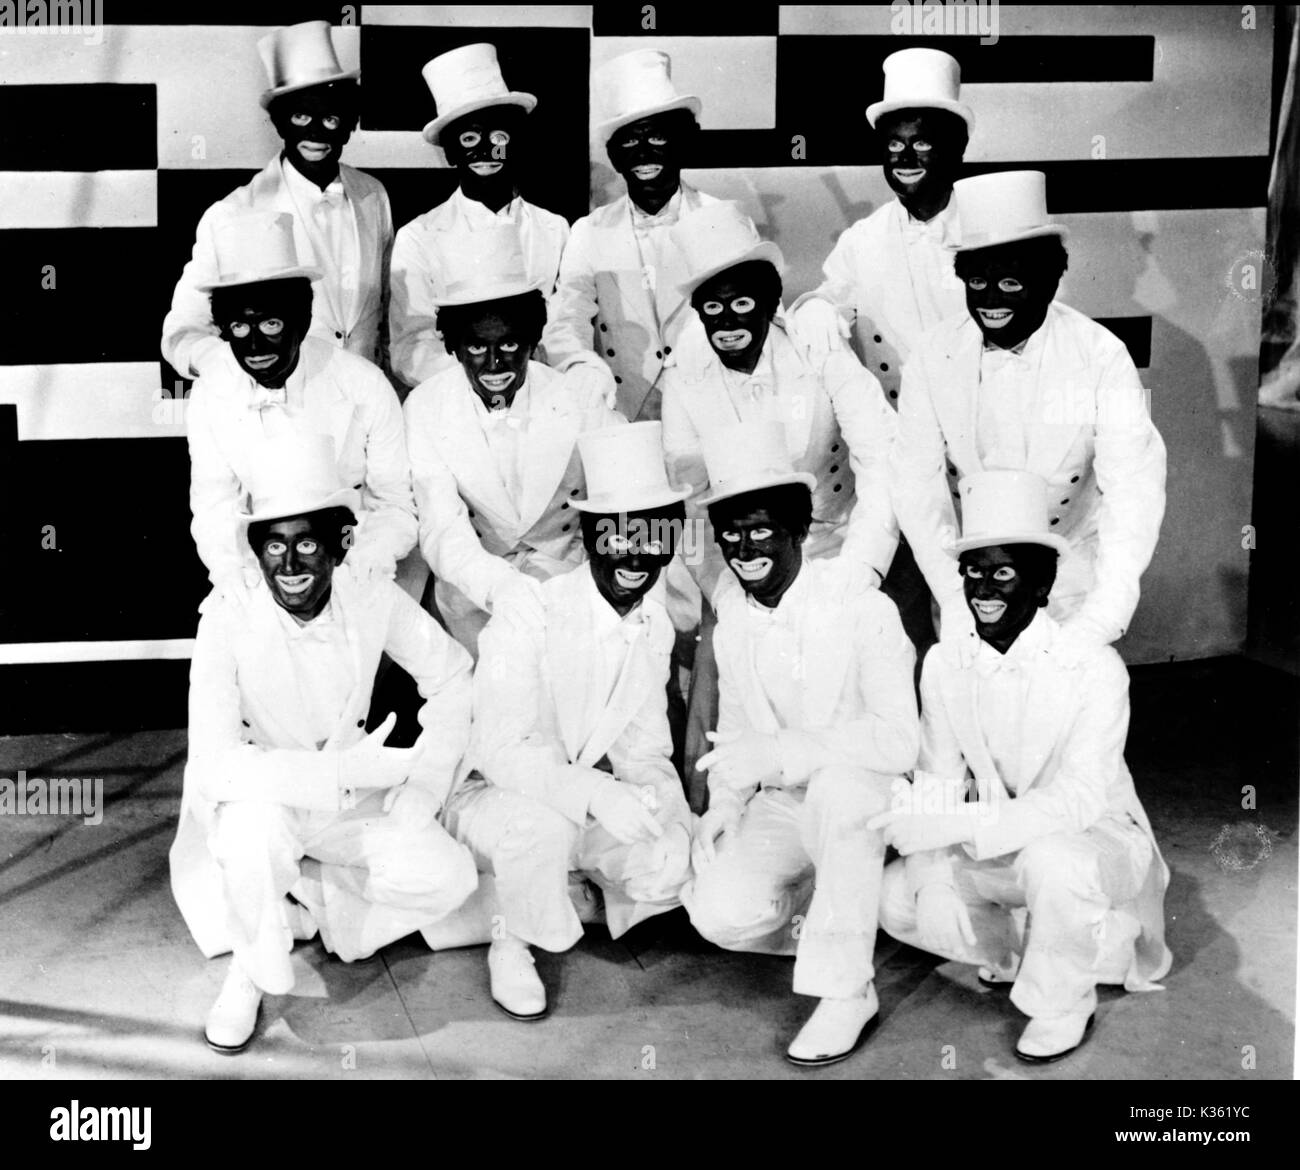 Black and white minstrel show stock photos black and for Black and white shows